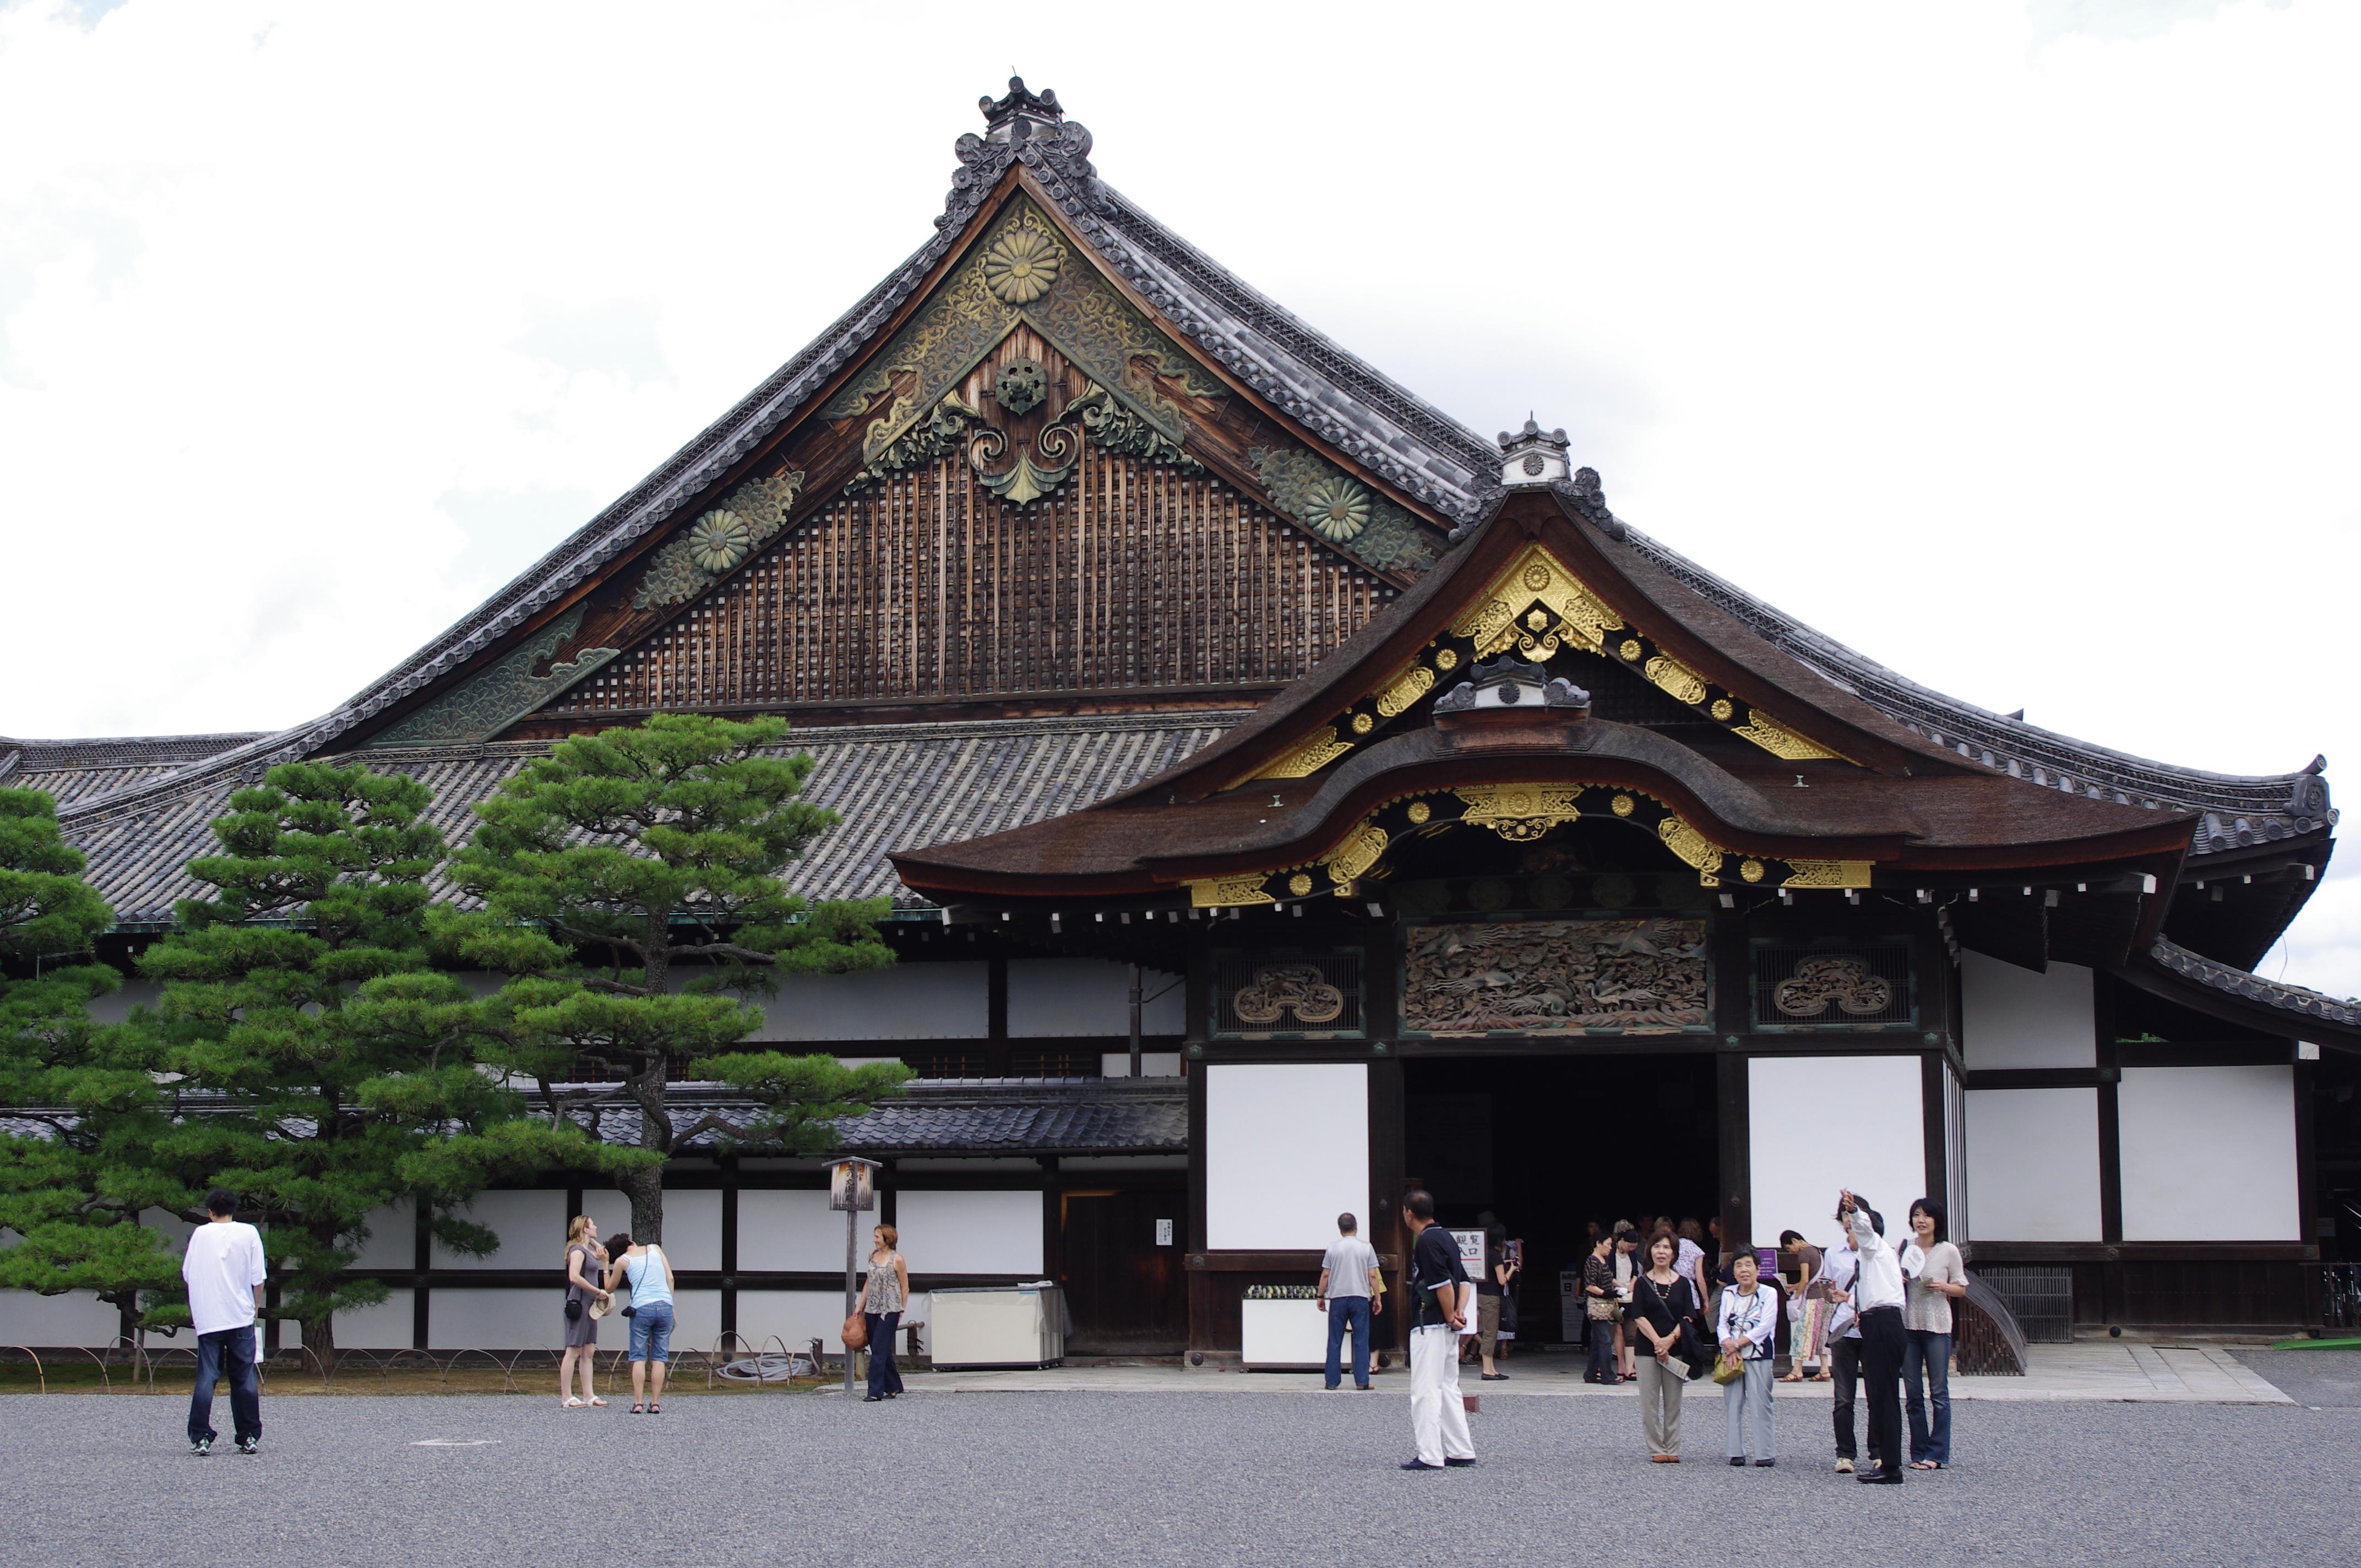 Old Japanese Architecture, Jisho-in Mausoleum